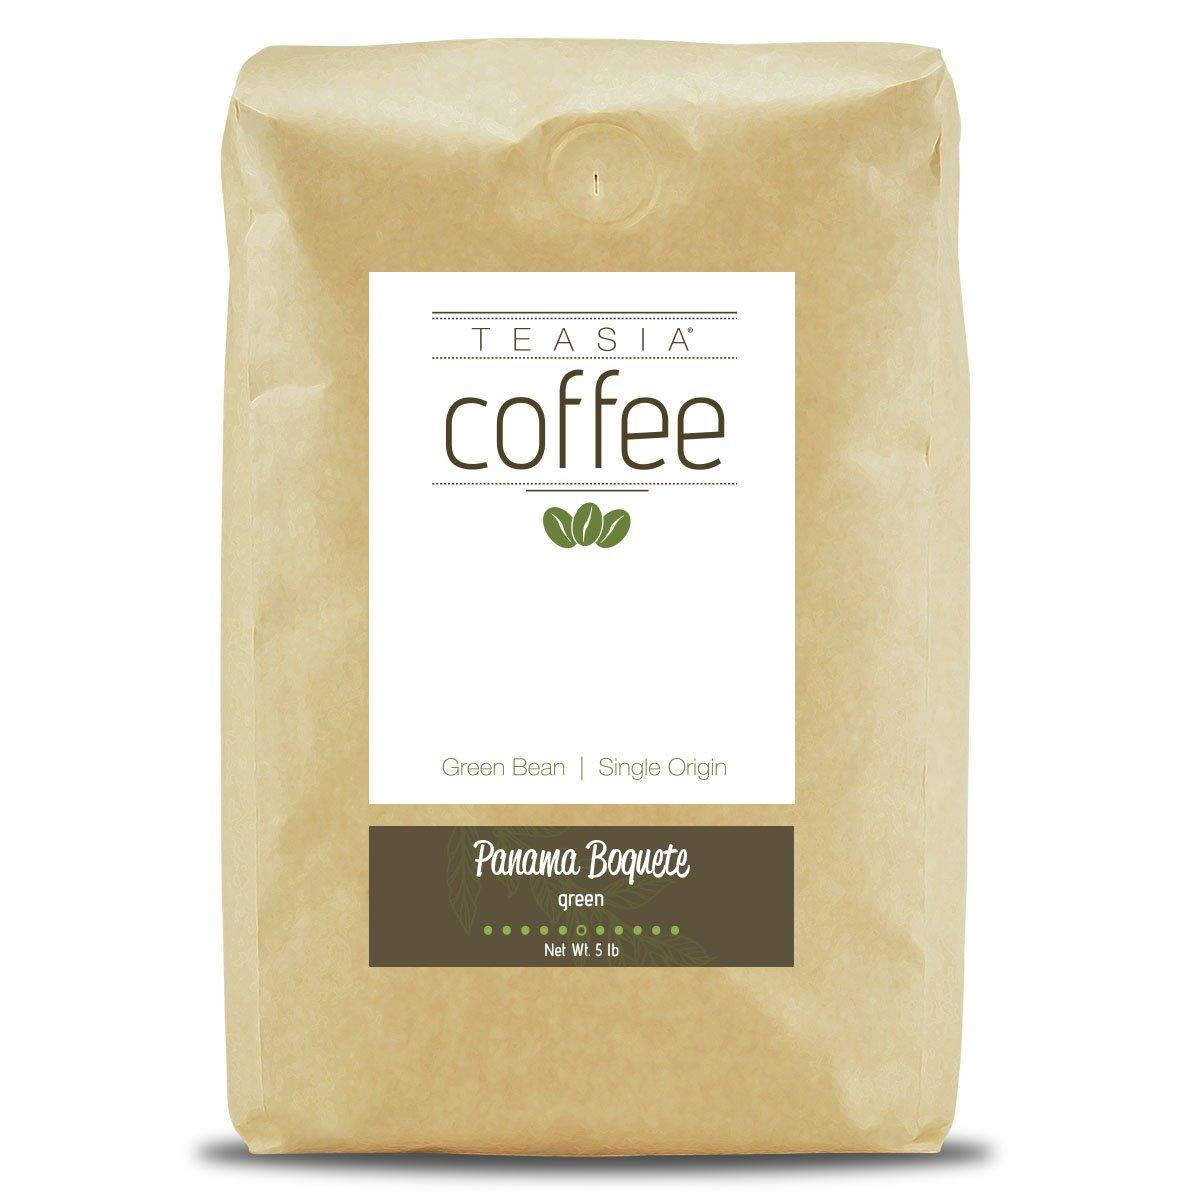 Teasia Coffee, Congo Kivu, Single Origin, Green Unroasted Whole Coffee Beans, 5-Pound Bag CPPE Inc.